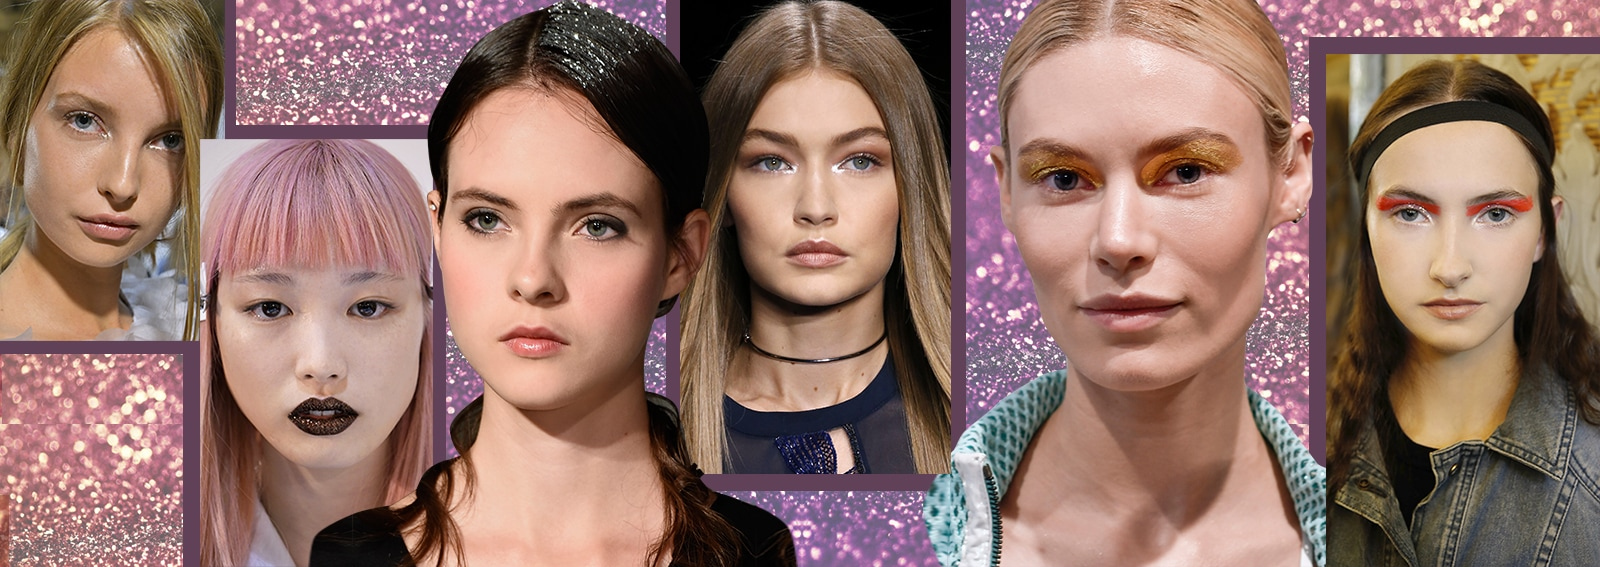 Glitter-make-up-pe-2017_desktop